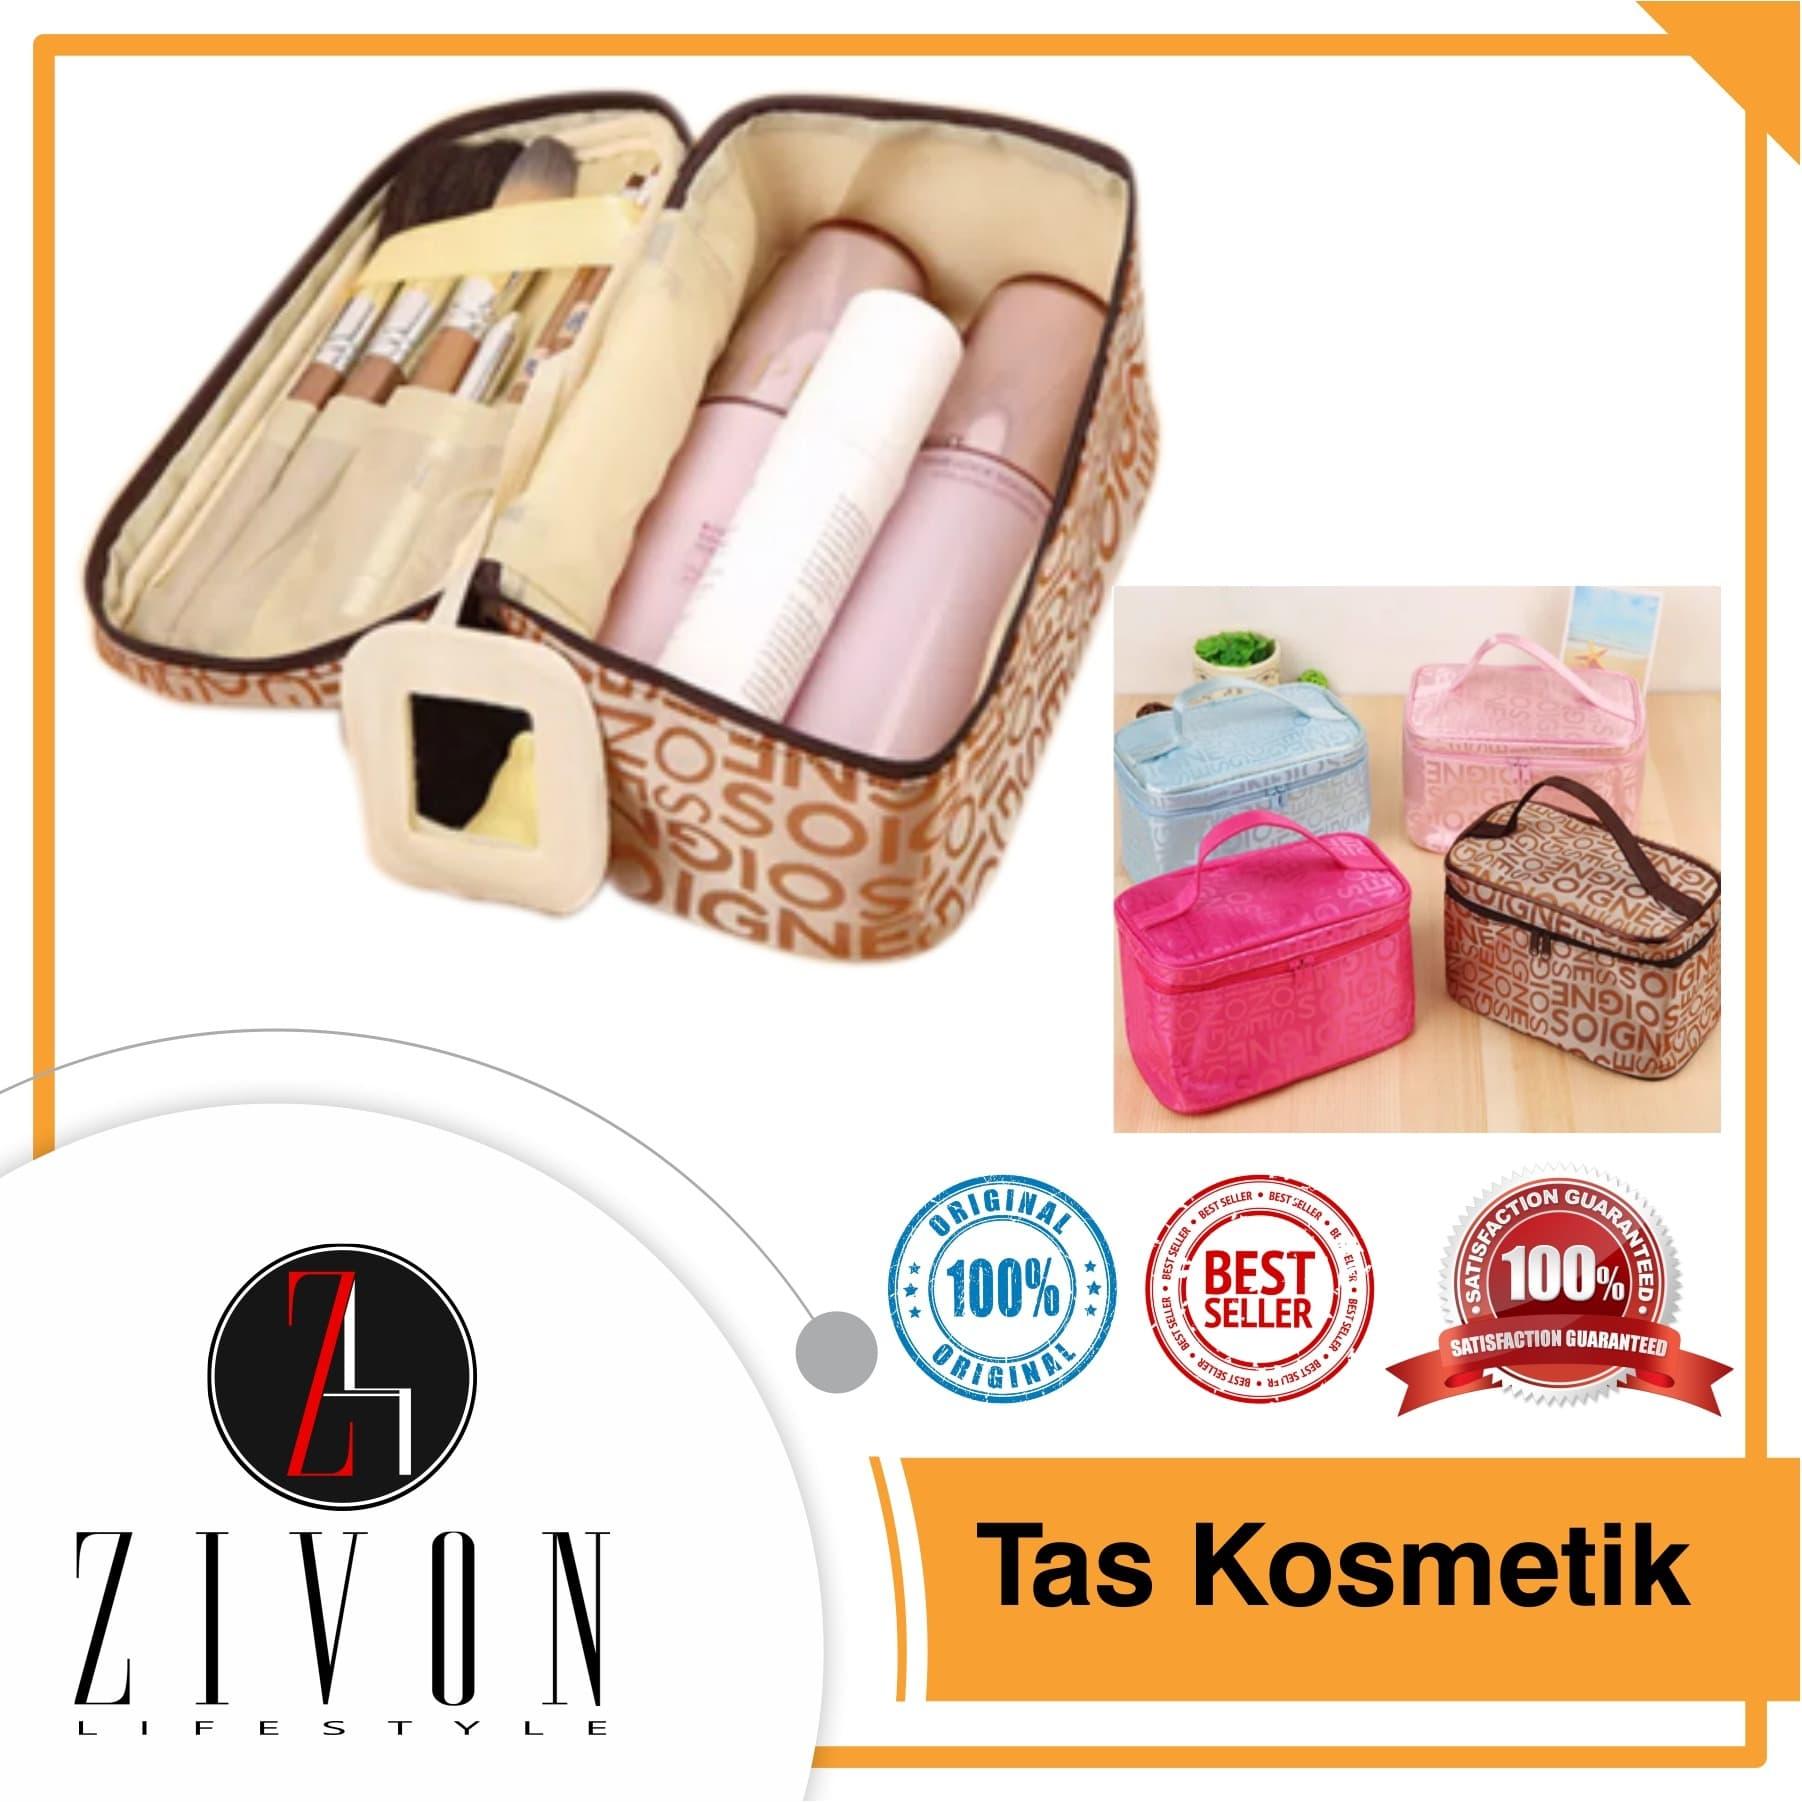 Tas Kosmetik Cosmetic organizer pouch Monopoly Travel bag KQ53 - Pink Fanta thumbnail